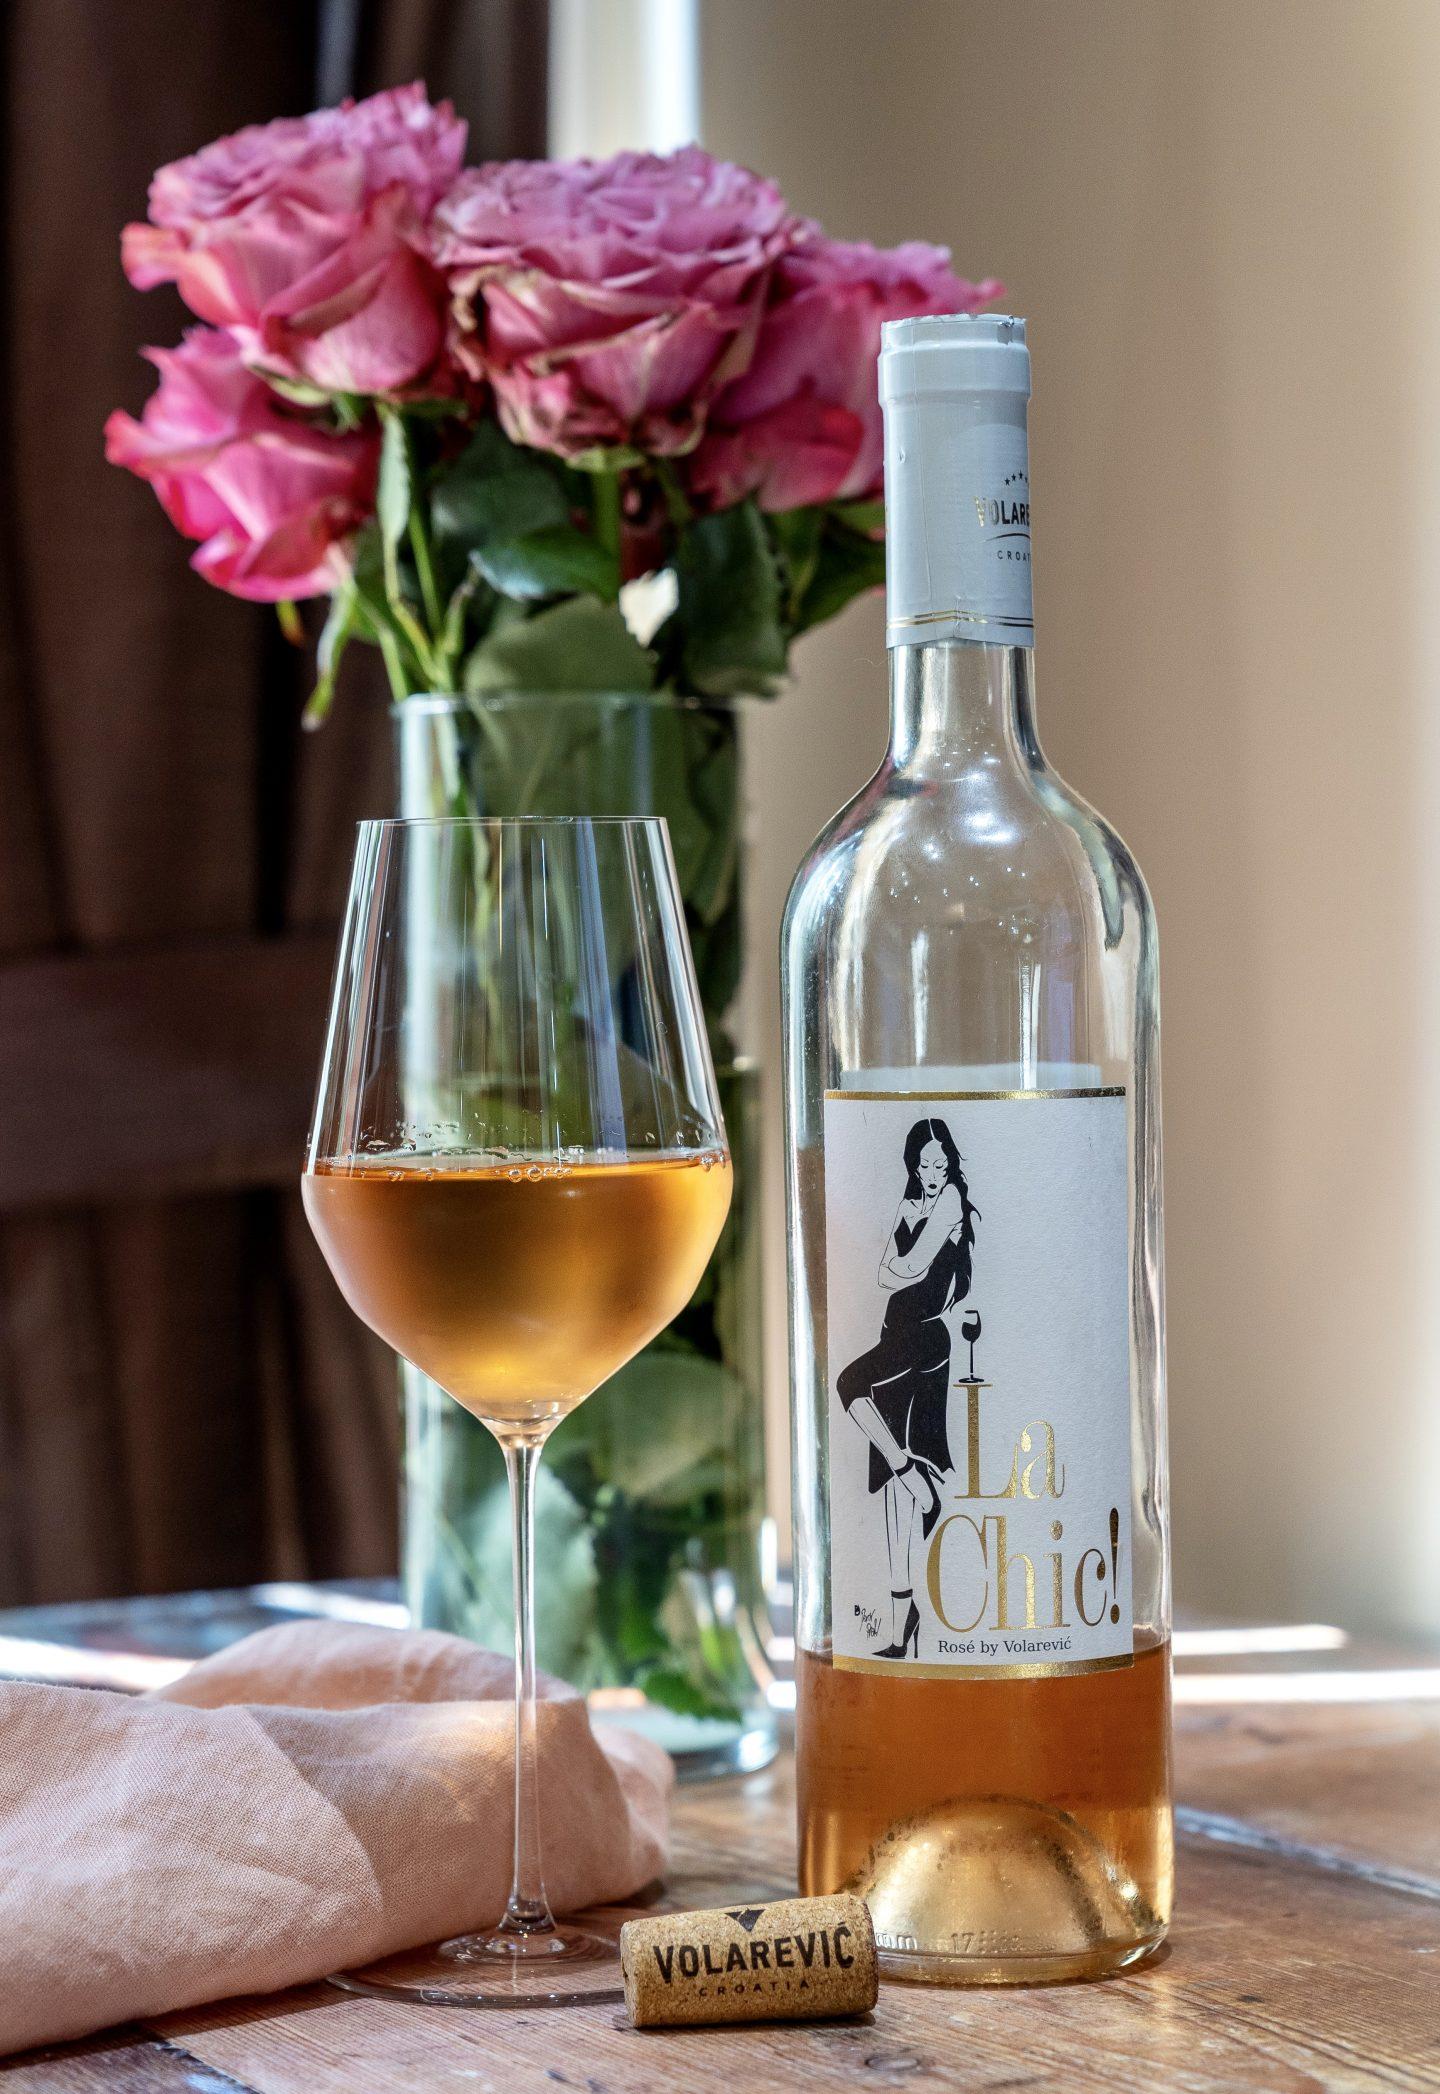 Croatian Rosé Wine Croatian Rosé Wine Croatian Rose Wine Croatian Rose Wine in Canada Croatian Rose wine in Toronto Croatian Rose wine in Ontario Volarević La Chic! Rosé 2019  Volarević winery